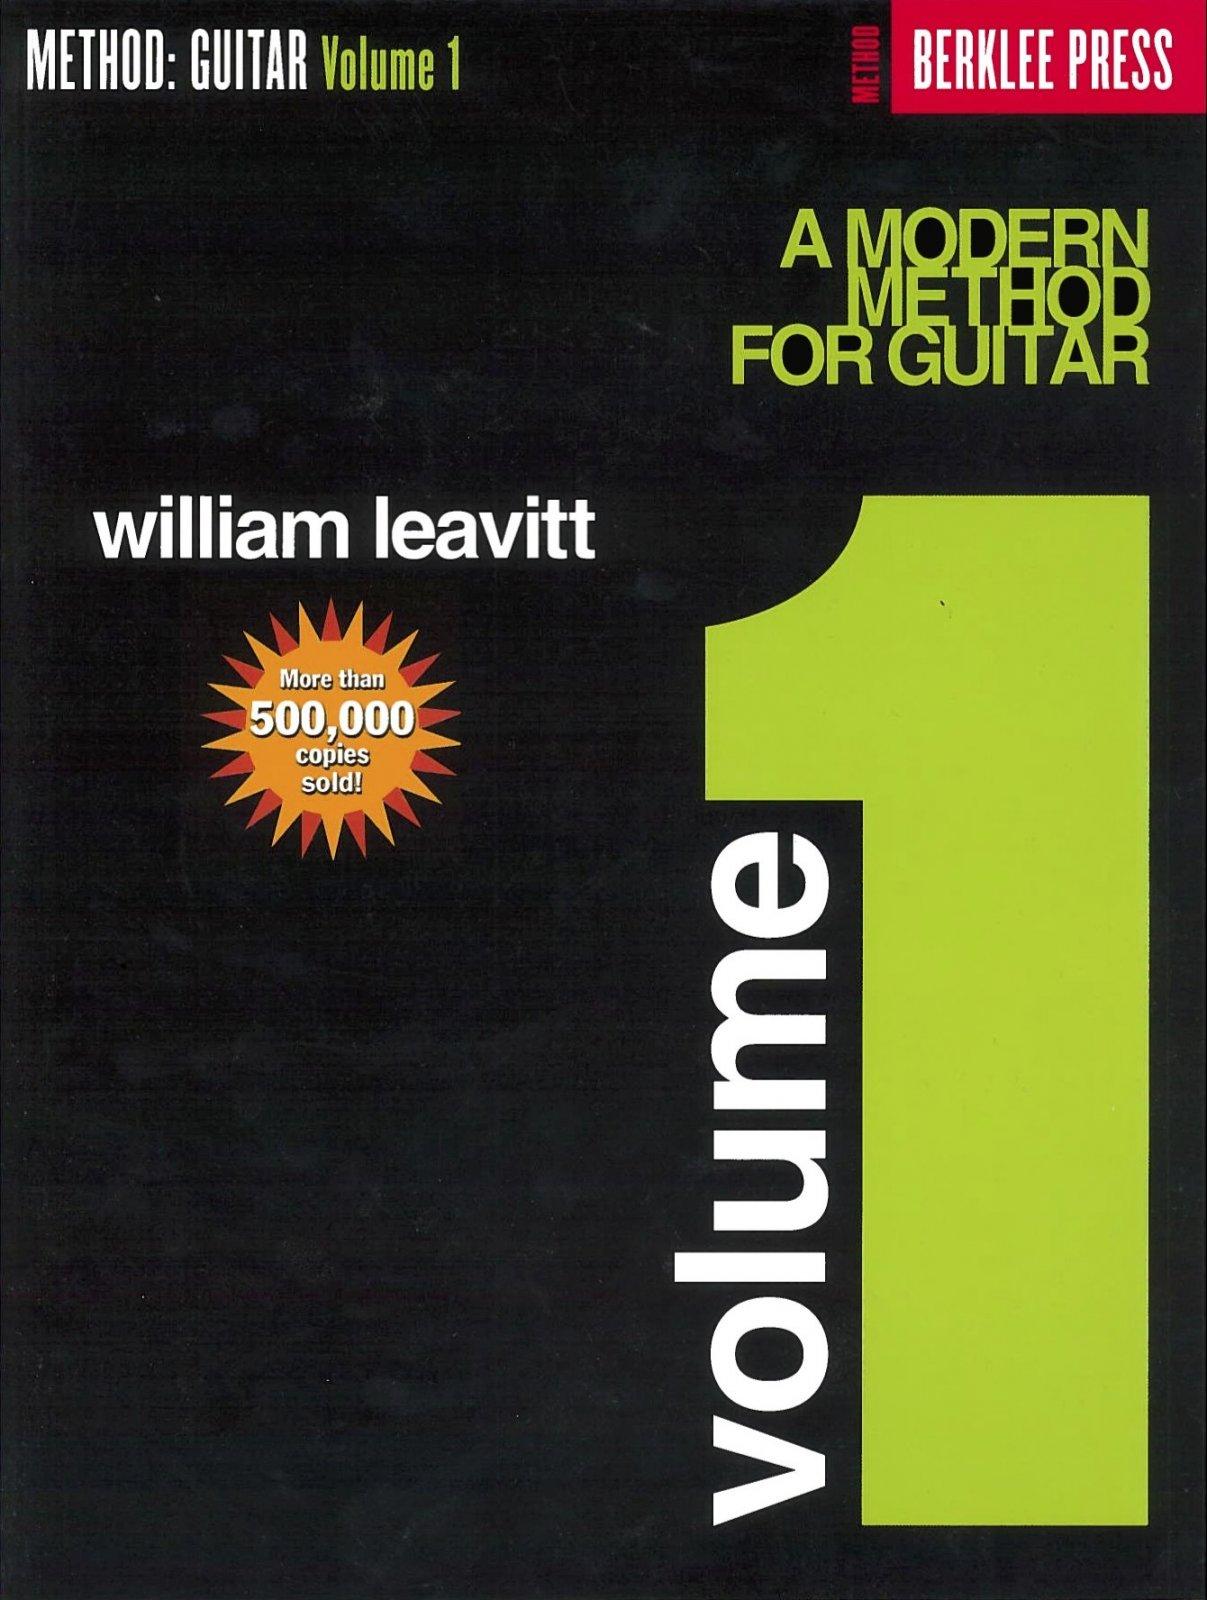 A Modern Method for Guitar - Berklee Press